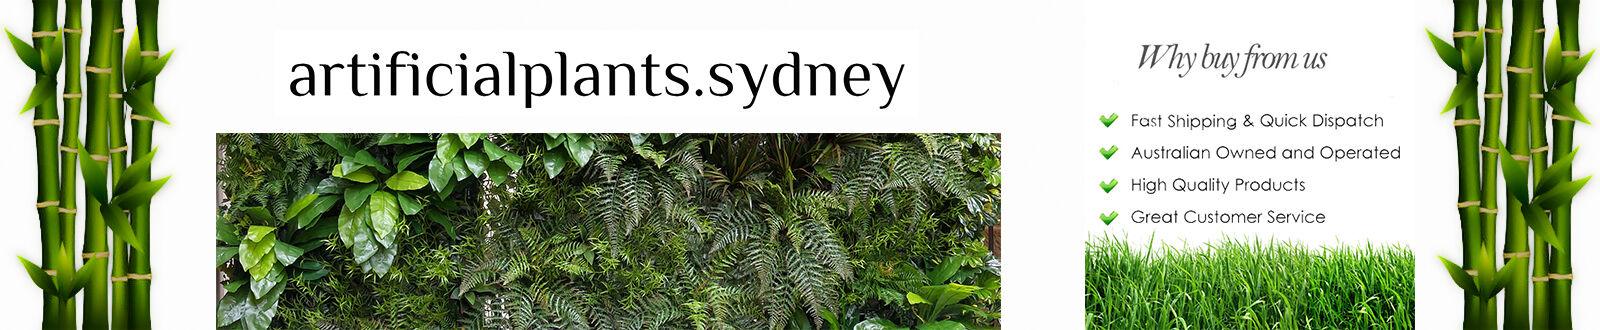 artificialplants.sydney